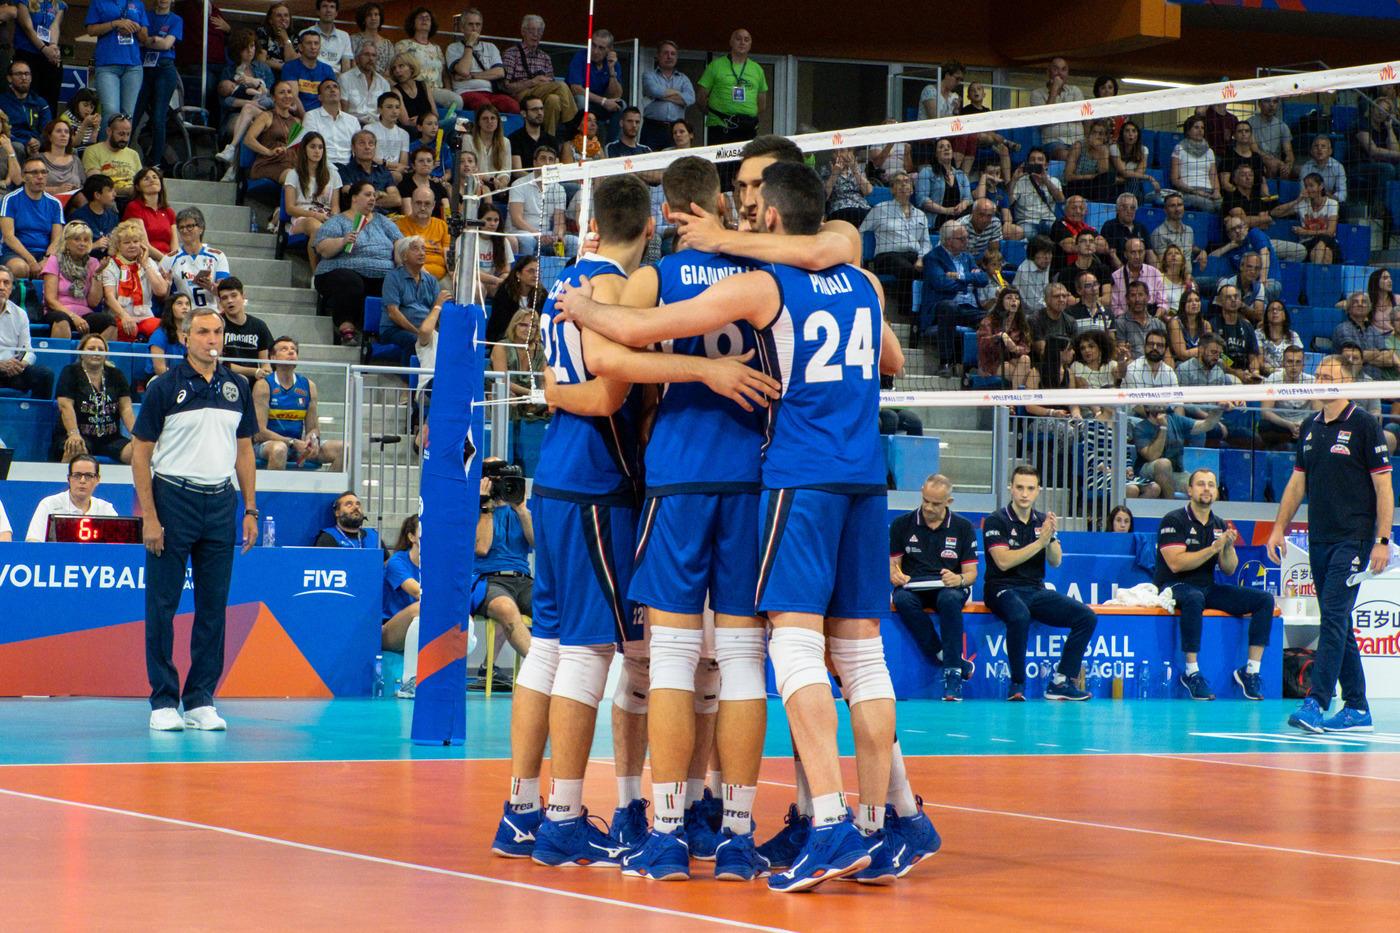 L'Italvolley batte 3-0 la Serbia in un match di Nations League maschile